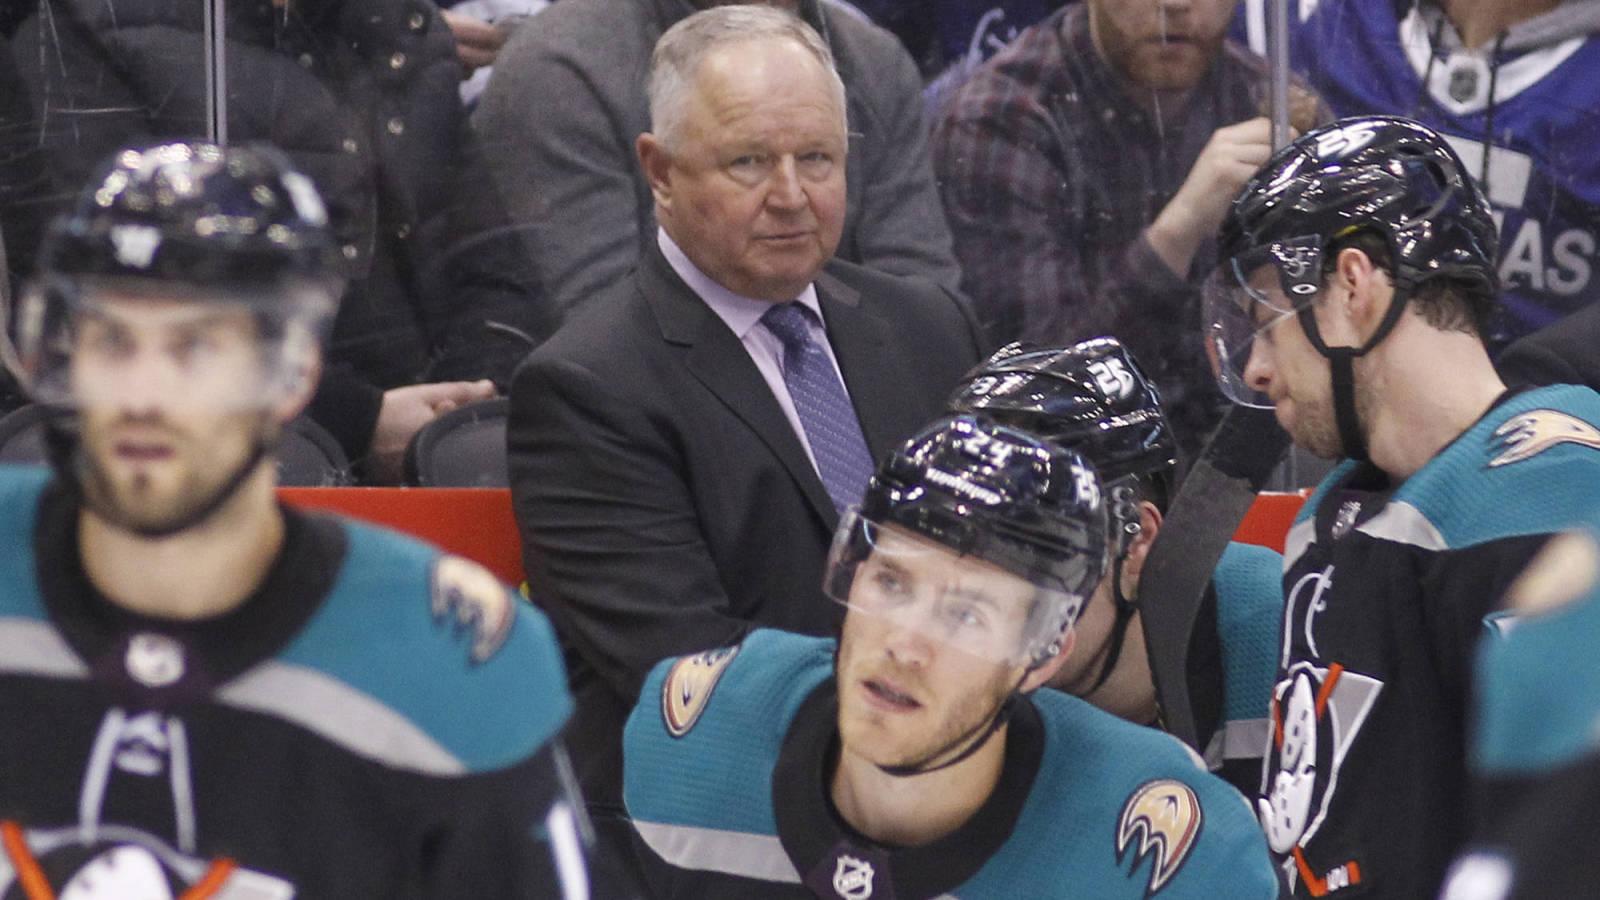 Anaheim Ducks' coaching search remains open | Yardbarker